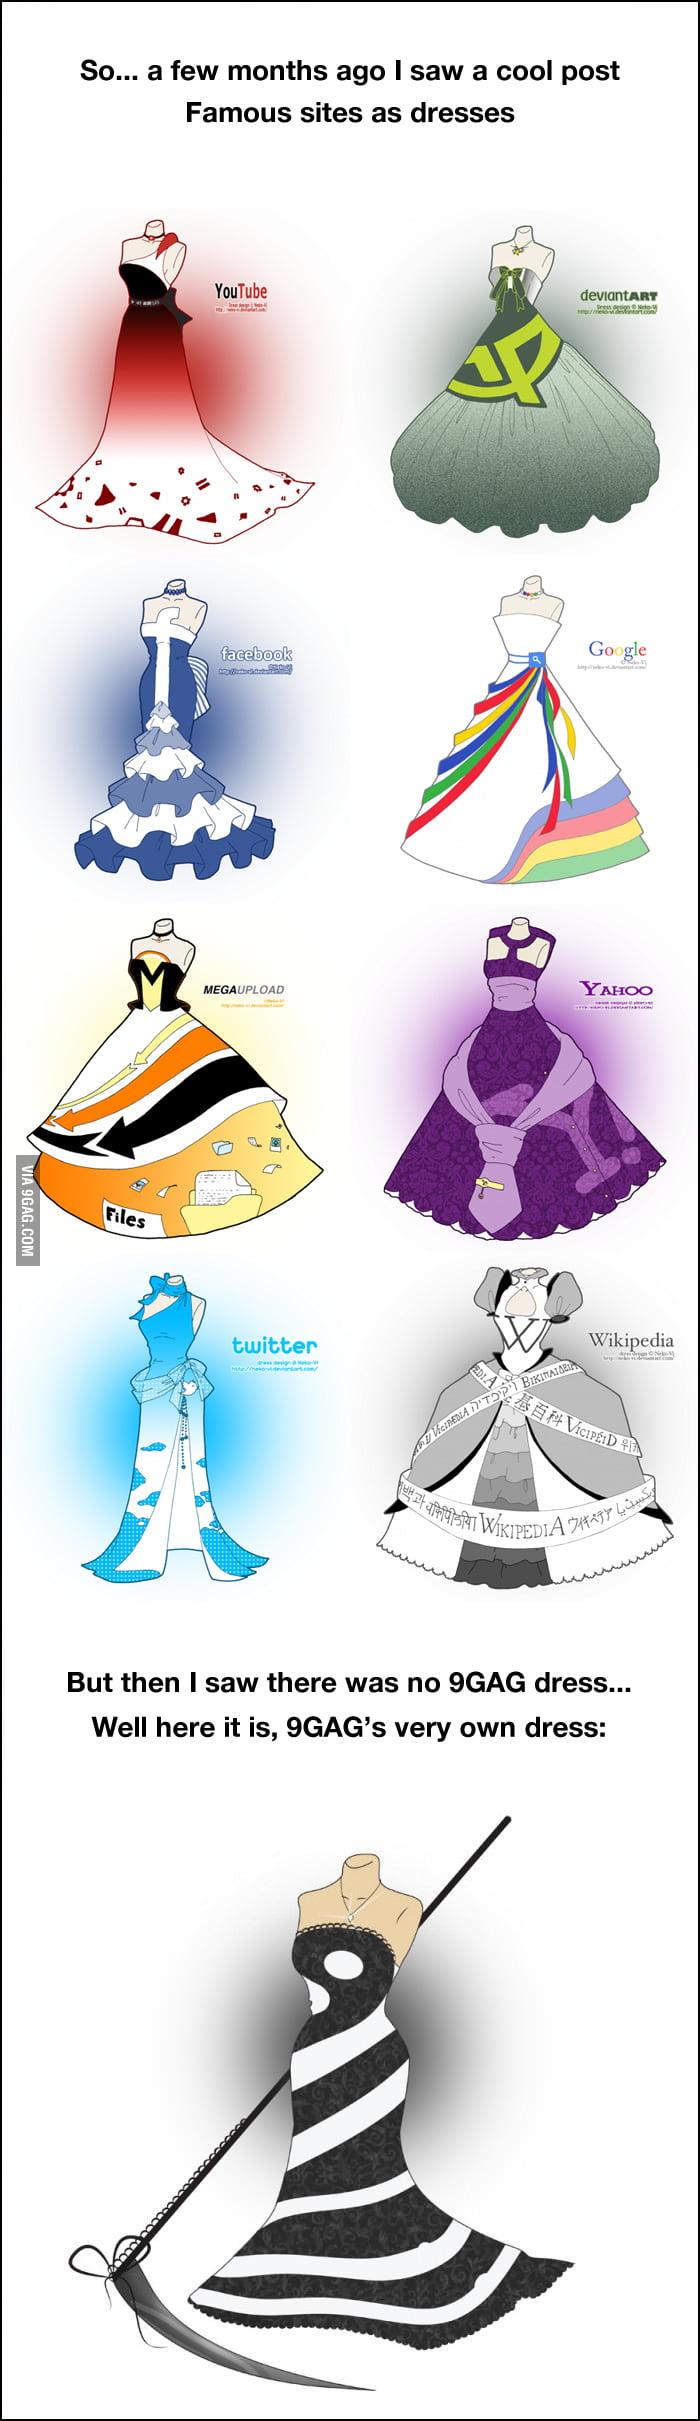 The 9GAG dress